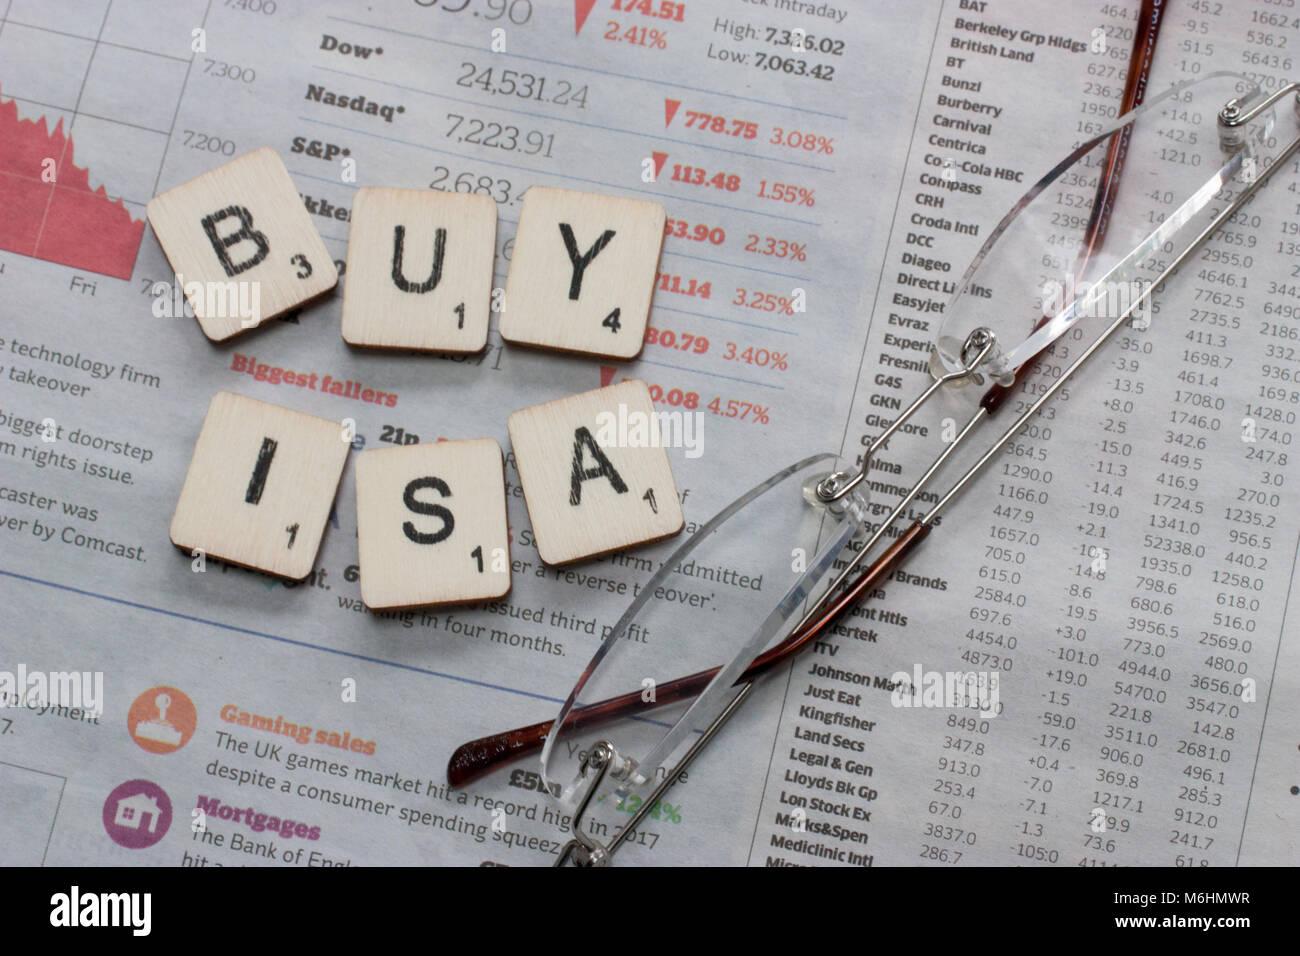 Buy Newspaper Stock Photos & Buy Newspaper Stock Images - Alamy